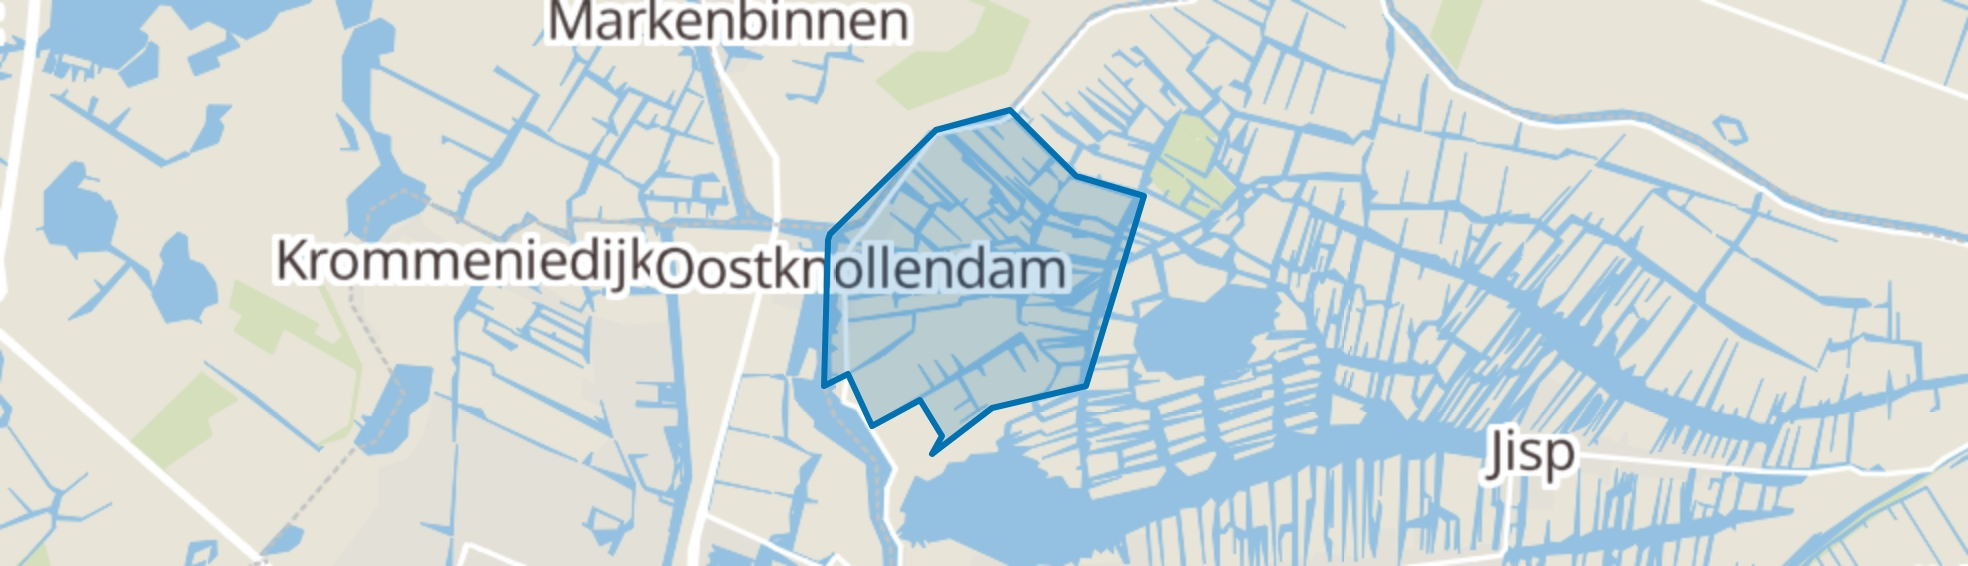 Oostknollendam map